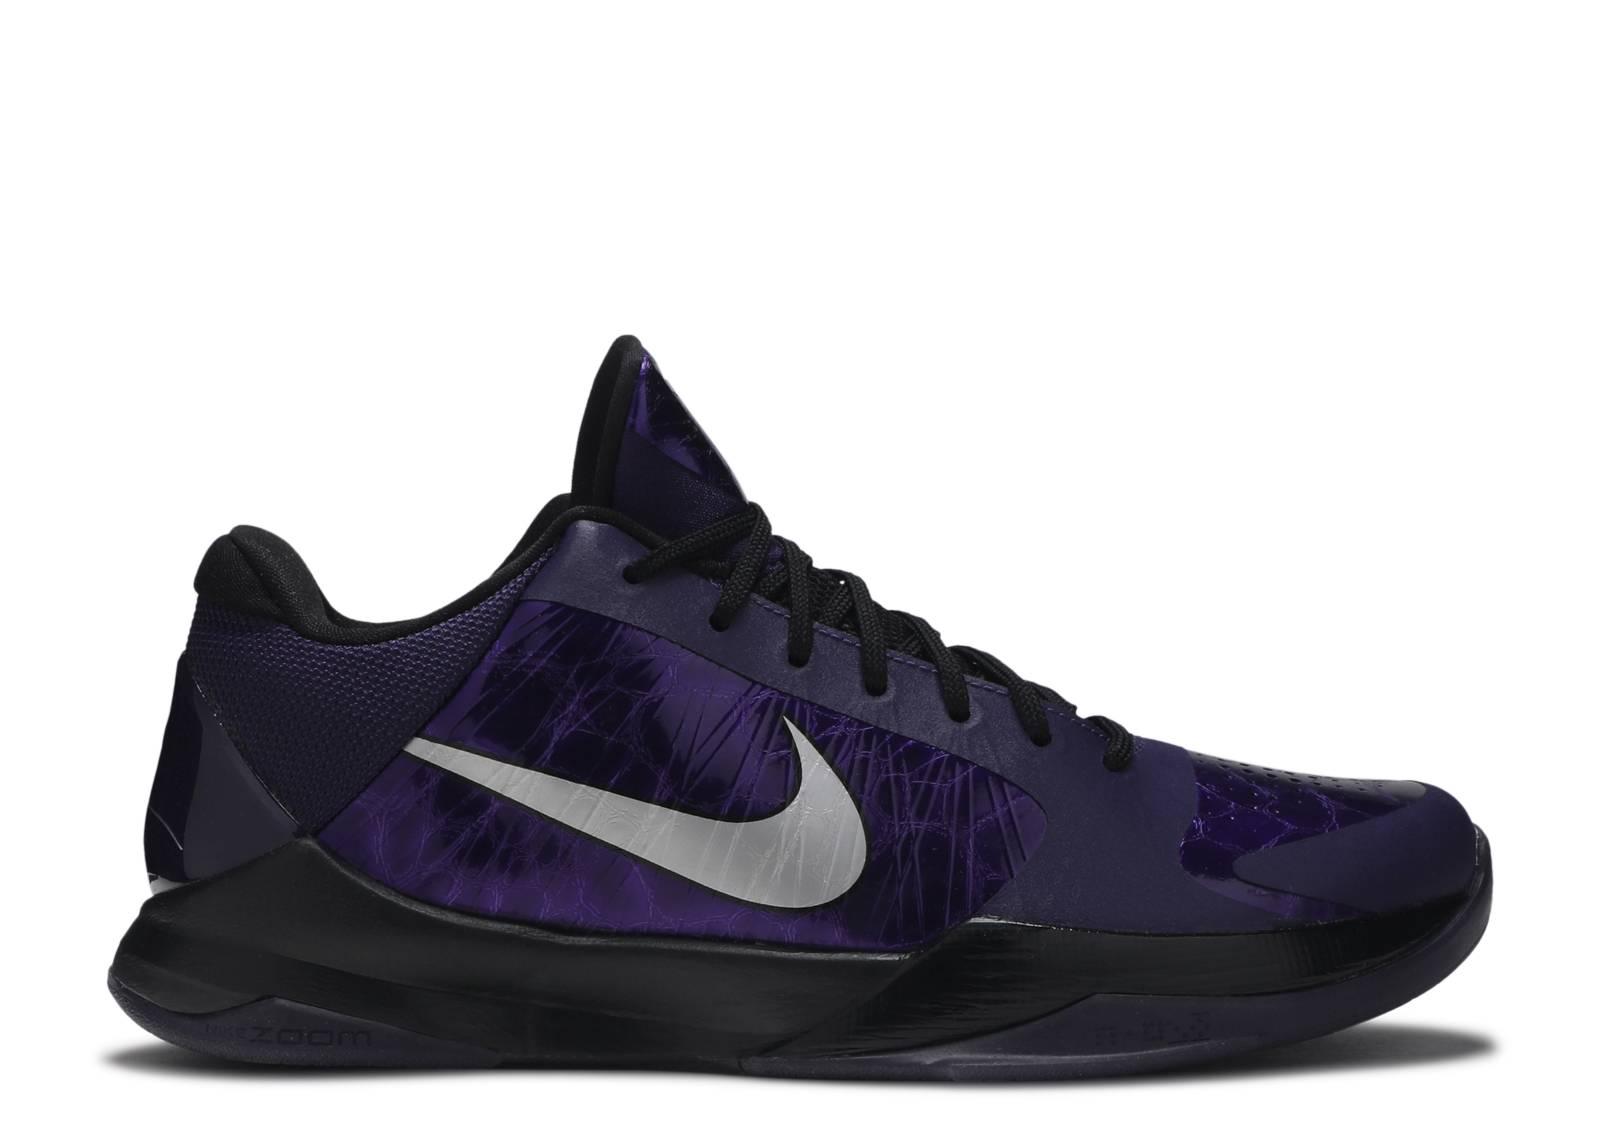 sports shoes 46979 294ee Zoom Kobe 5 - Nike - 386429 500 - inkmetallic silver-black-ice  Flight  Club